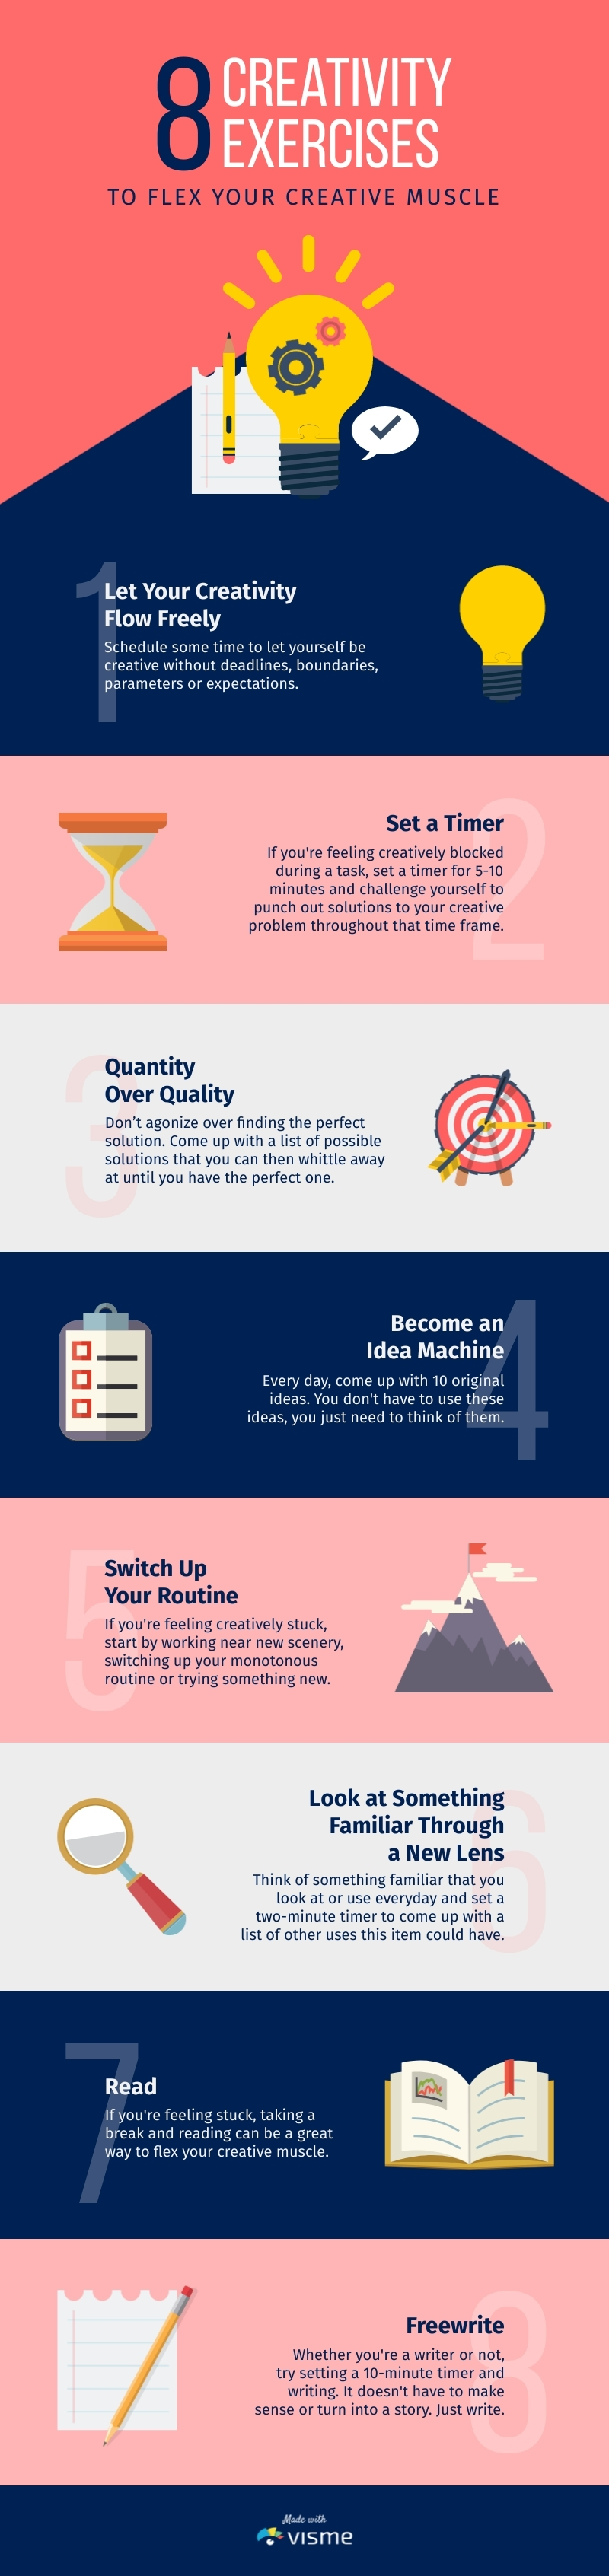 8 Creativity Exercises - Infographic  Template